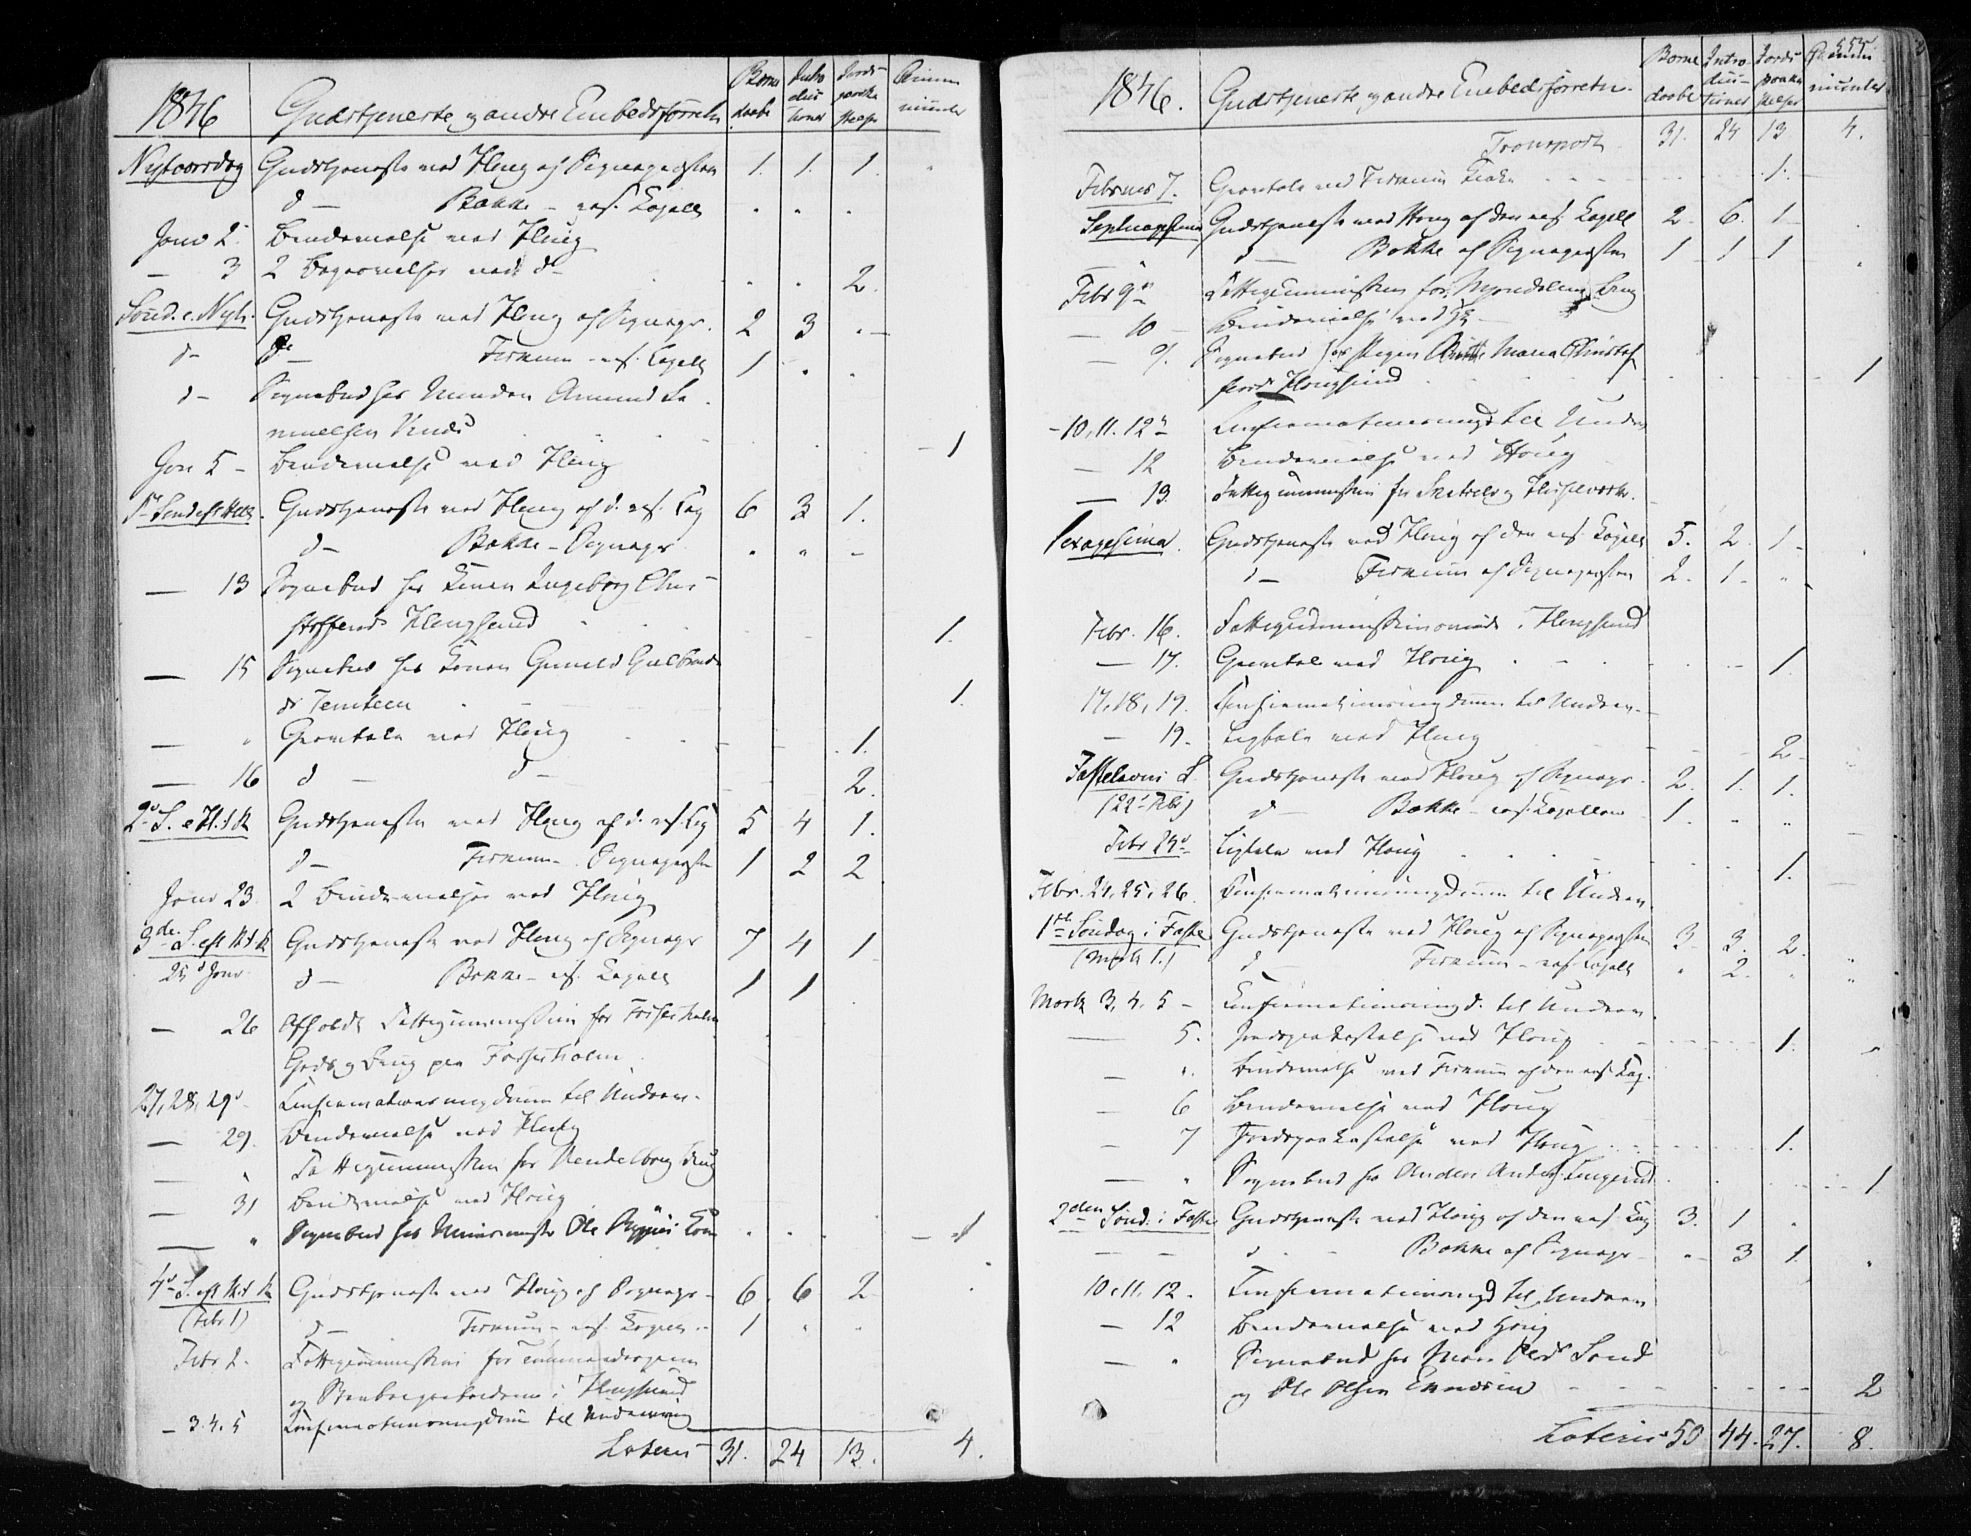 SAKO, Eiker kirkebøker, F/Fa/L0014: Parish register (official) no. I 14, 1846-1854, p. 554